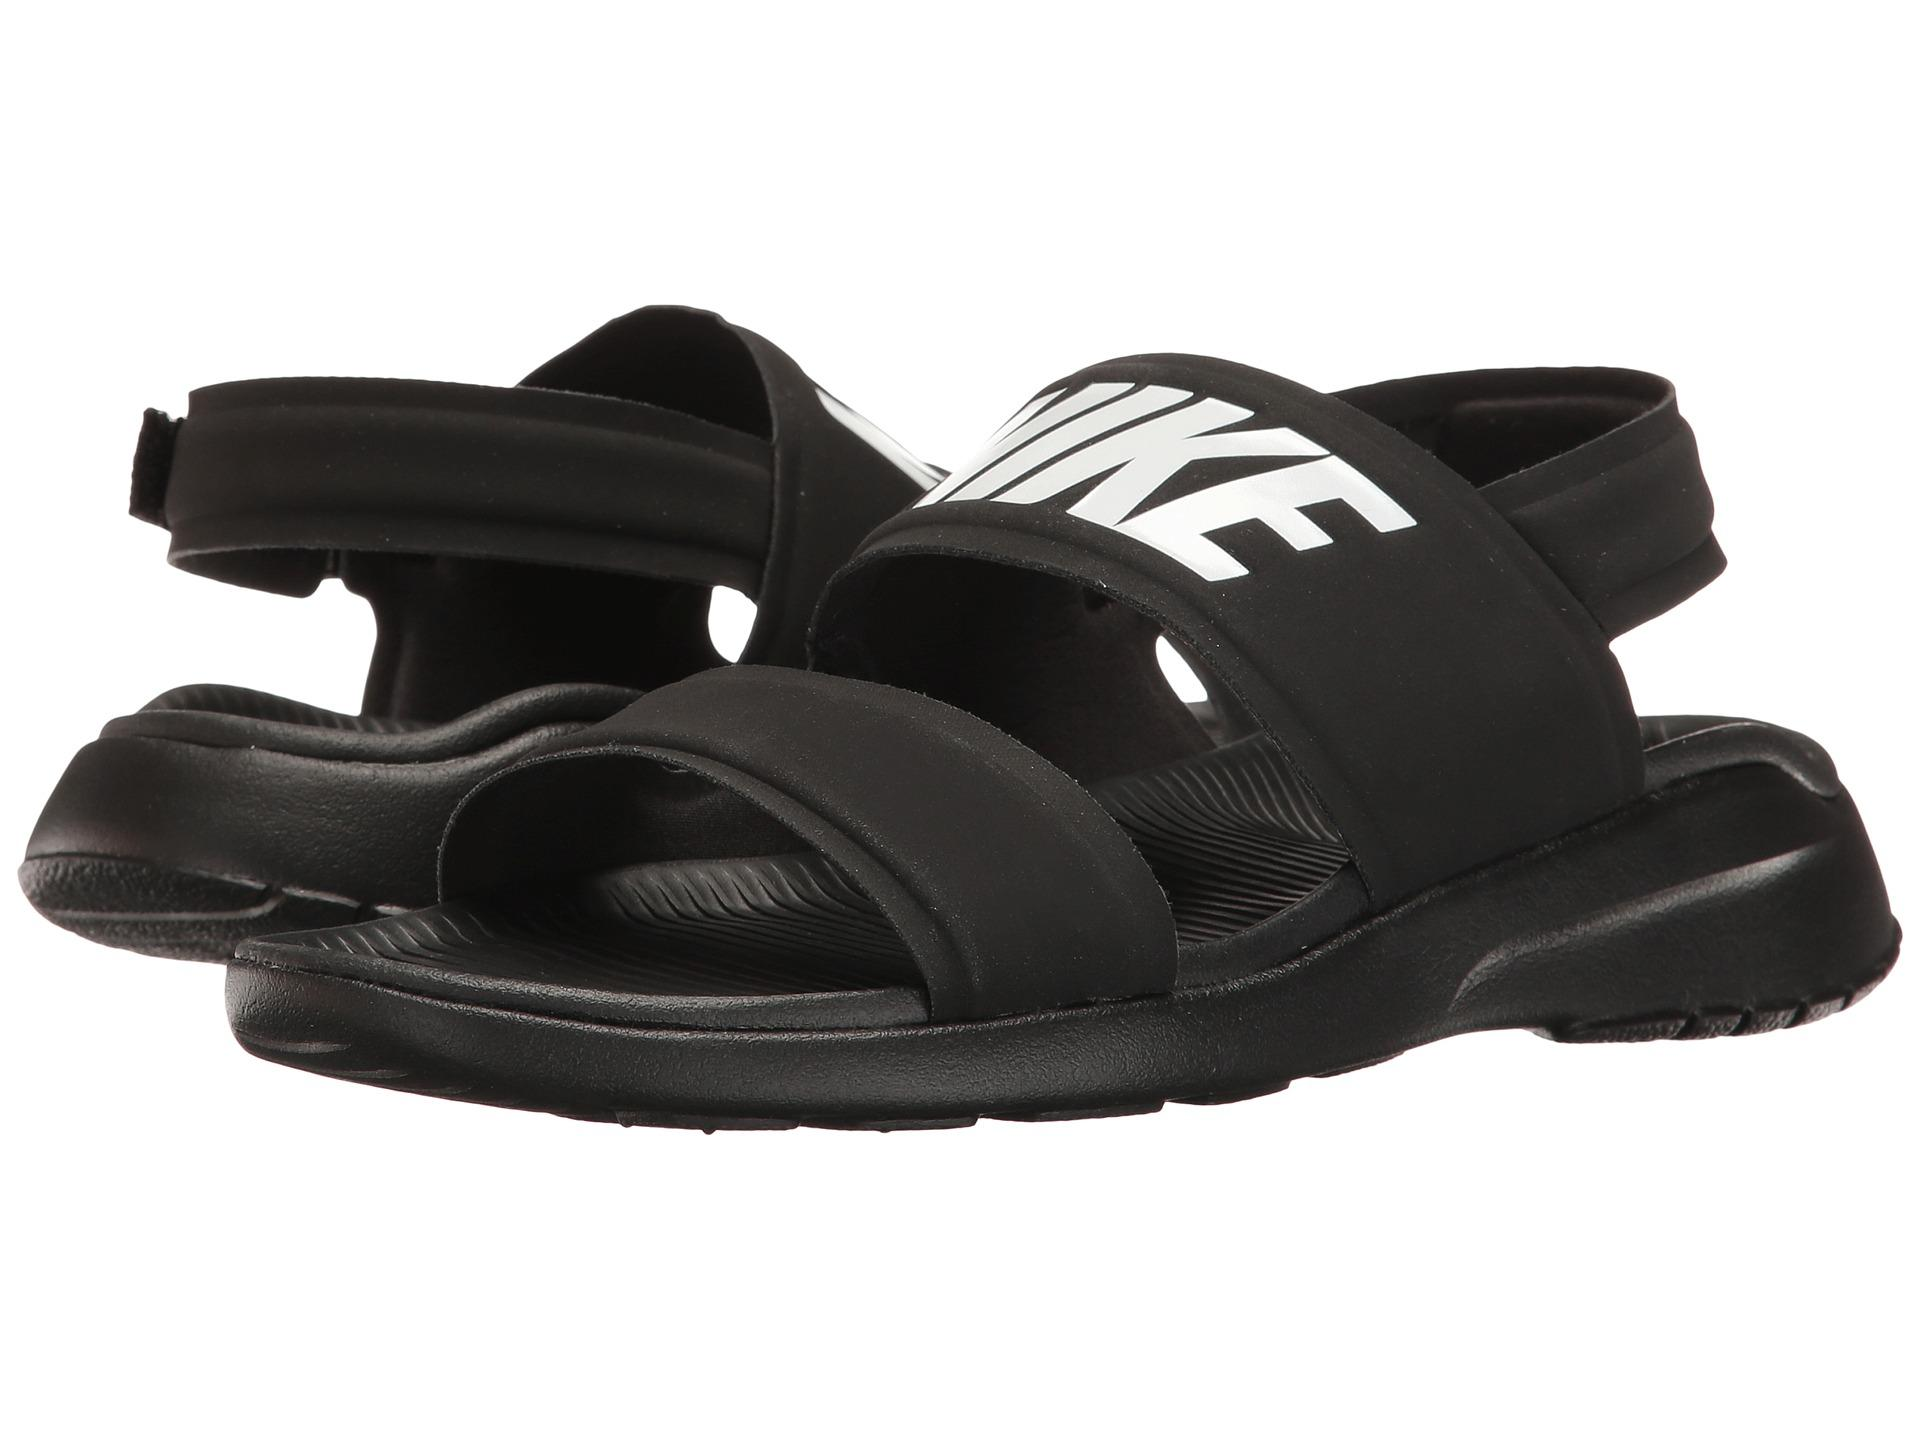 66200358aa70 ... discount nike tanjun sandal in black for men lyst. gallery ceb4a d05f4  ...